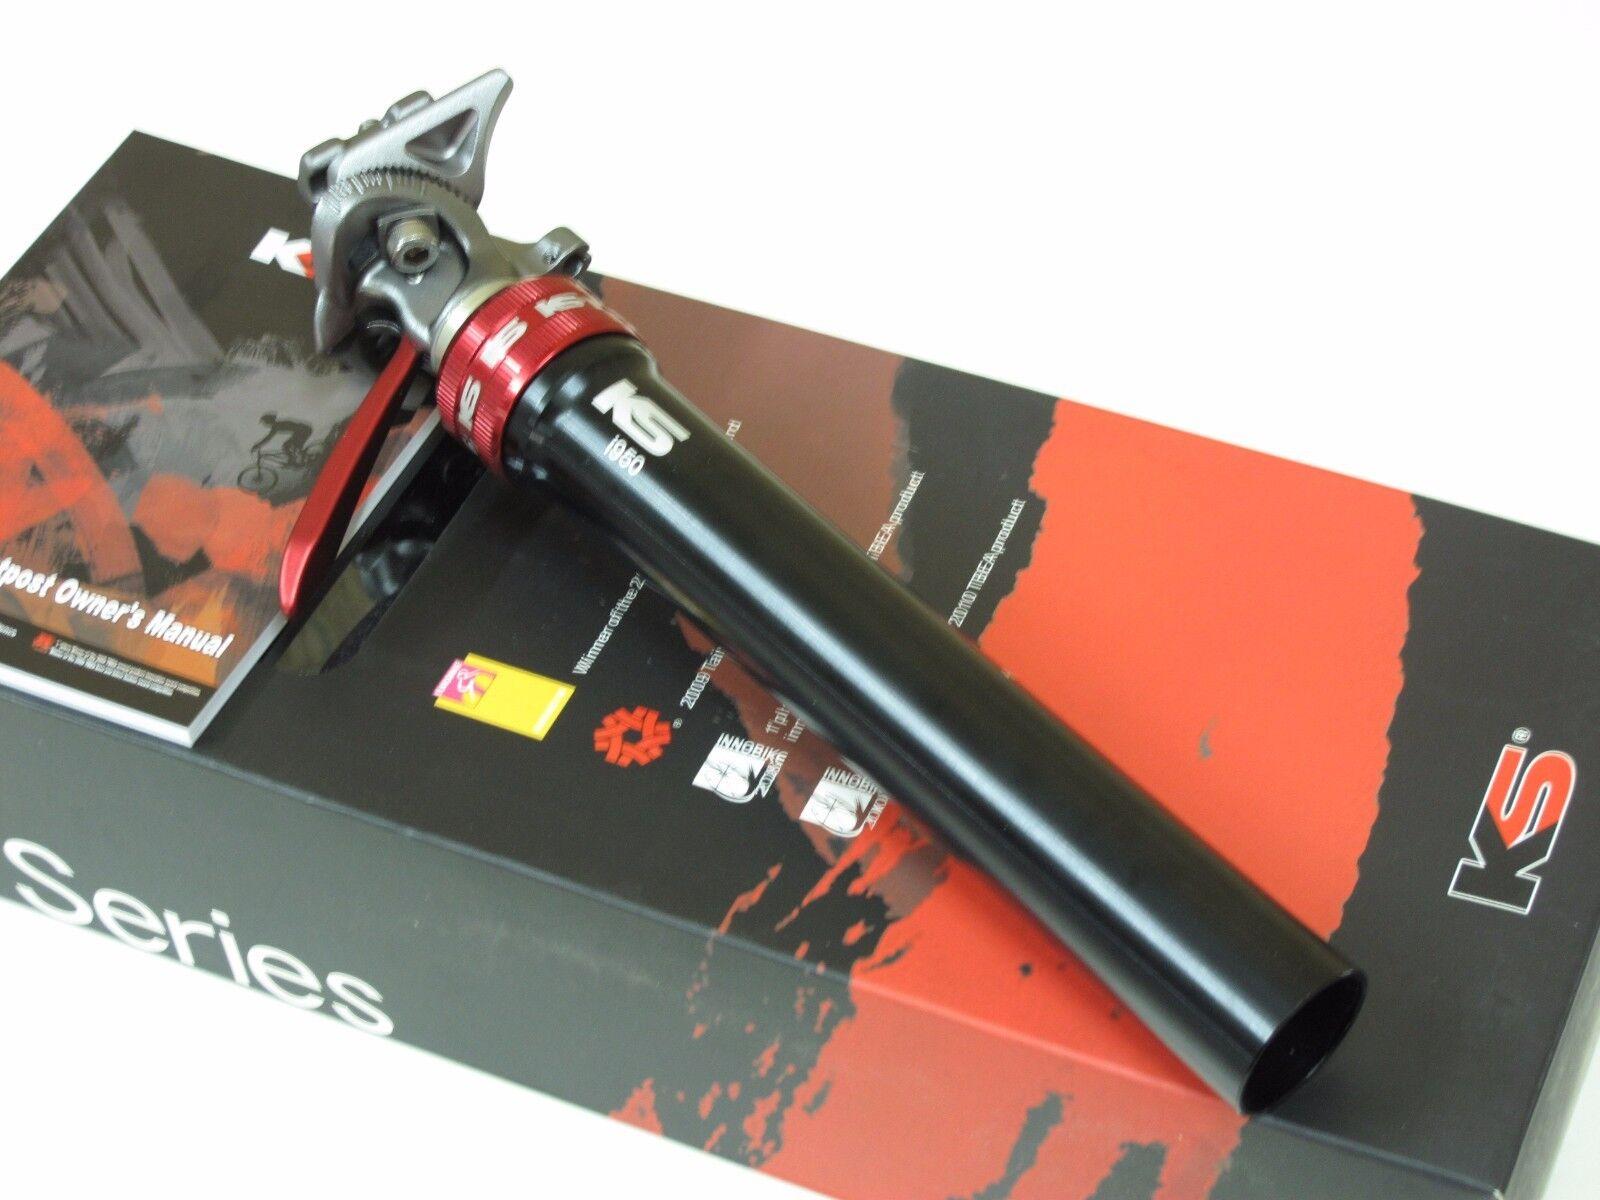 Nuevo KS I950 viaje ajustar 100mm tija de sillín 31.6 mm